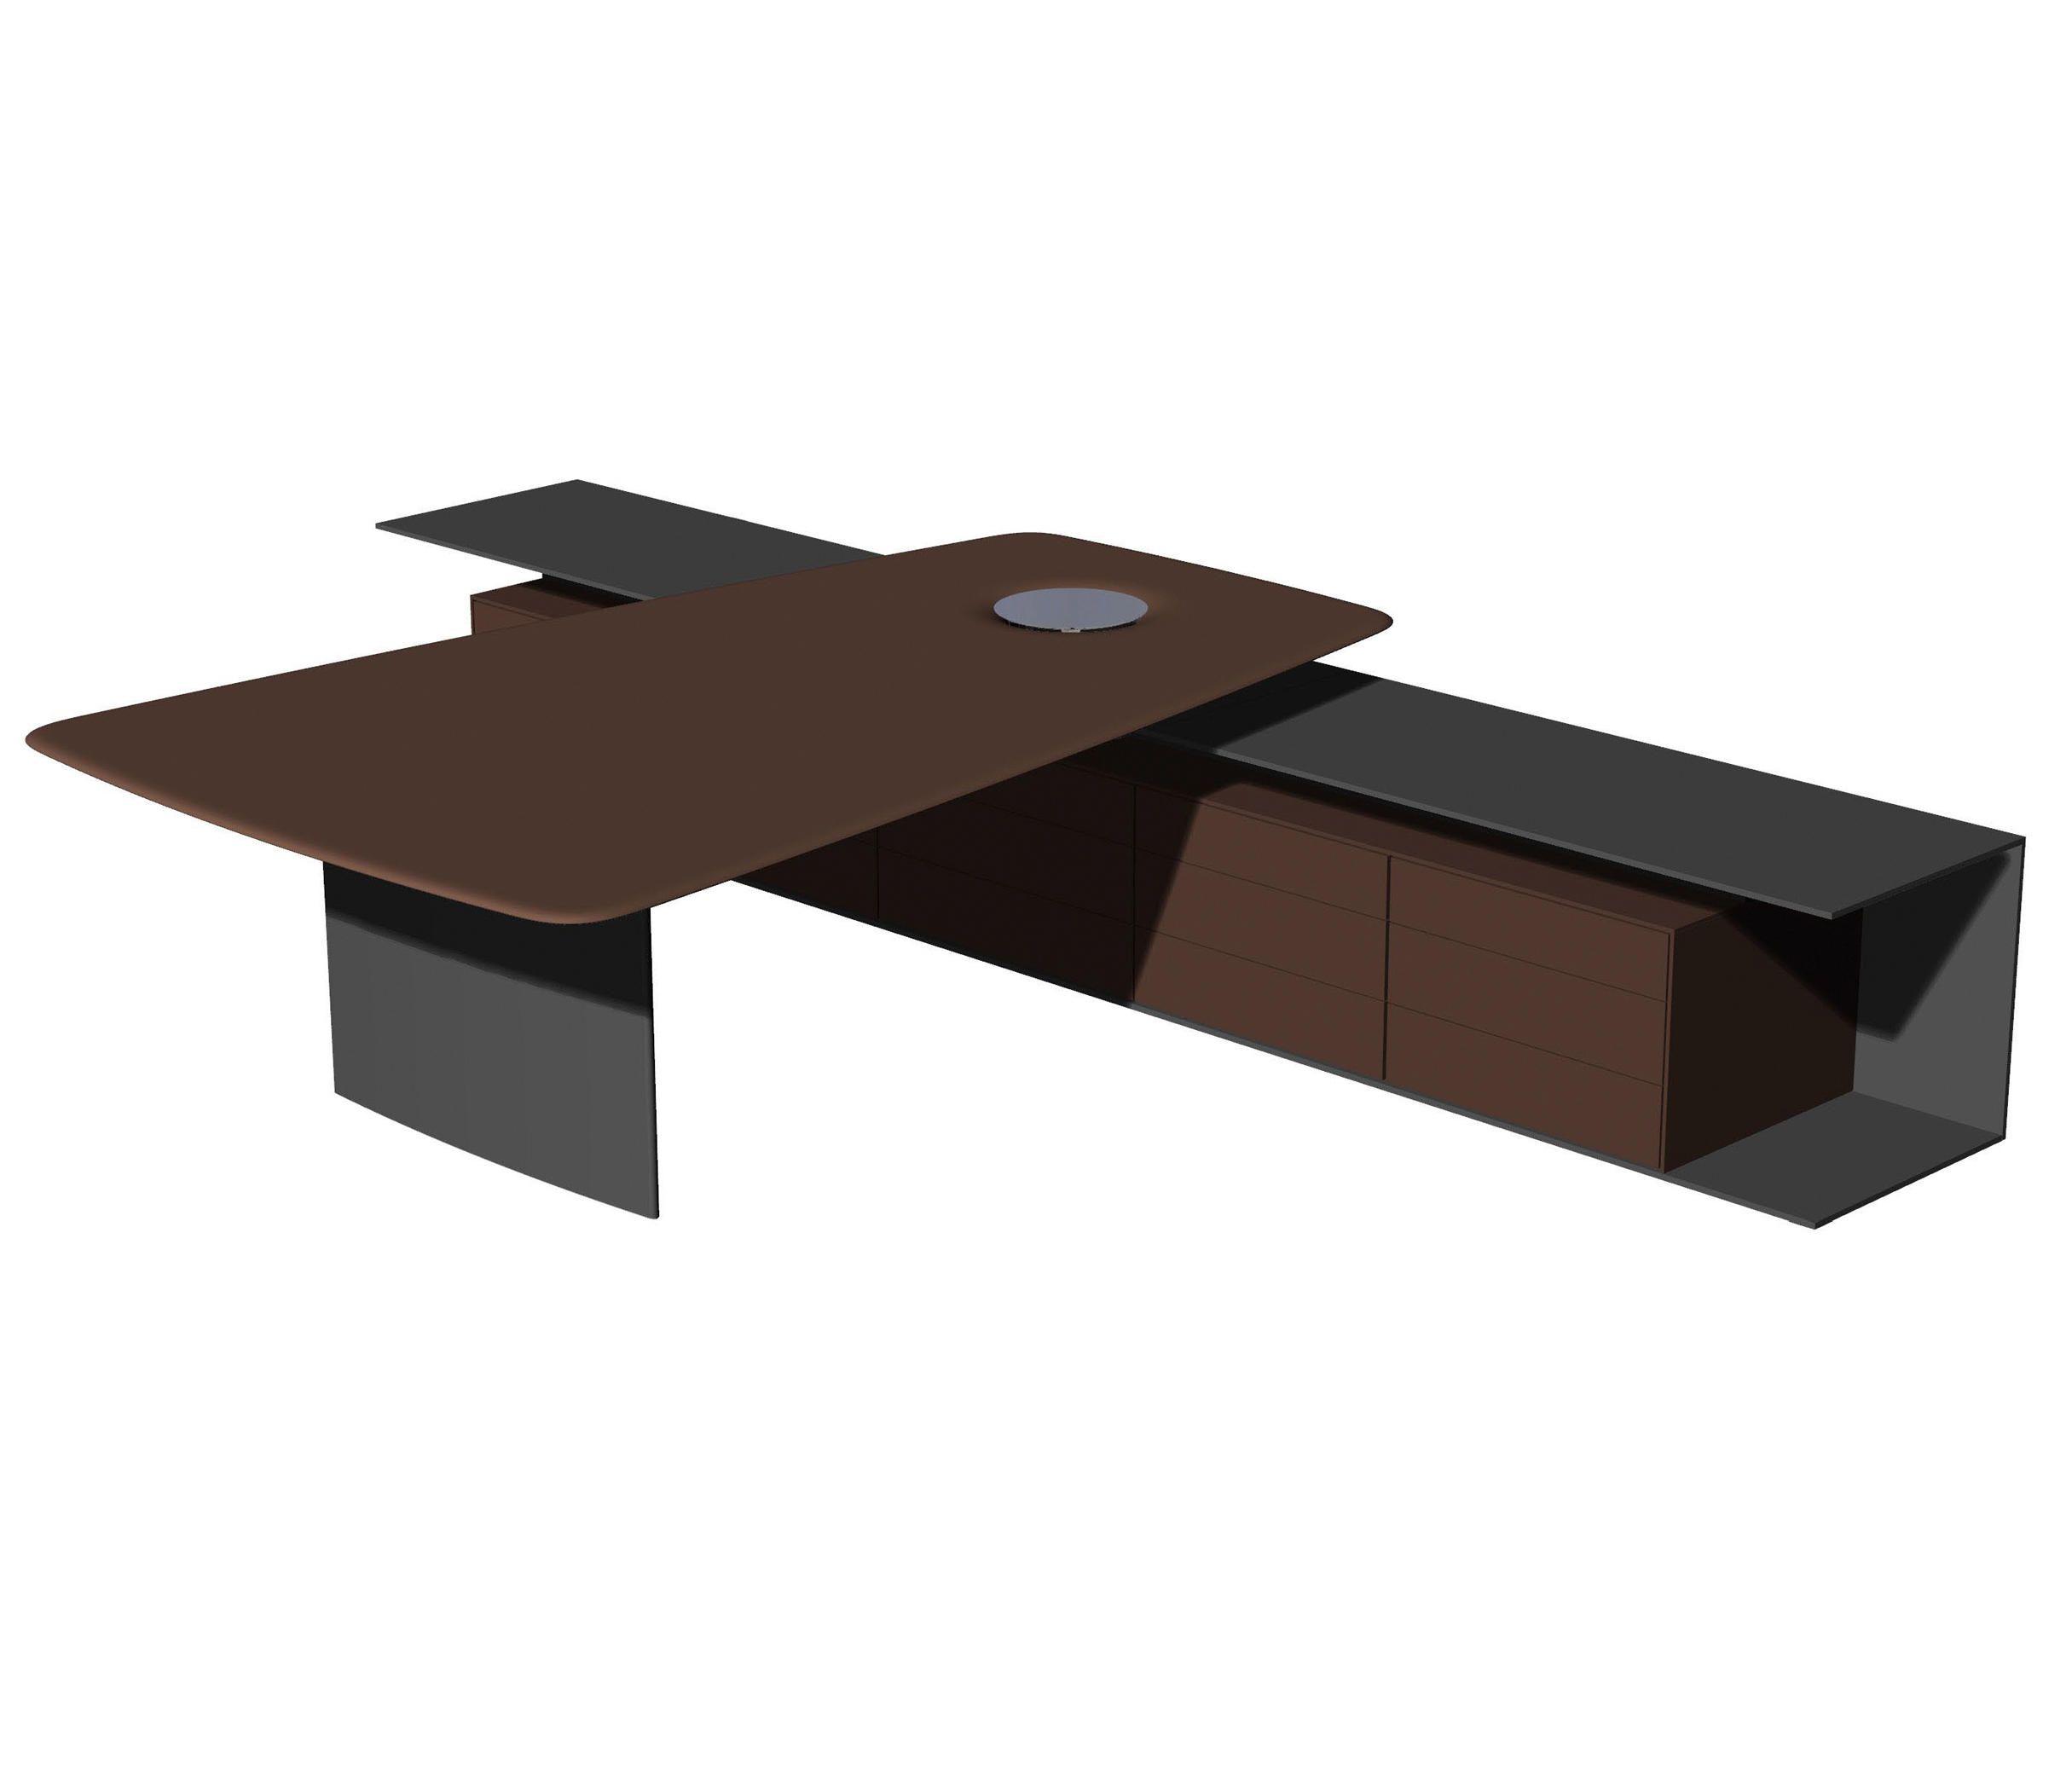 Keypiece Communication Desk Architonic In 2020 Walter Knoll Desk Desk Design